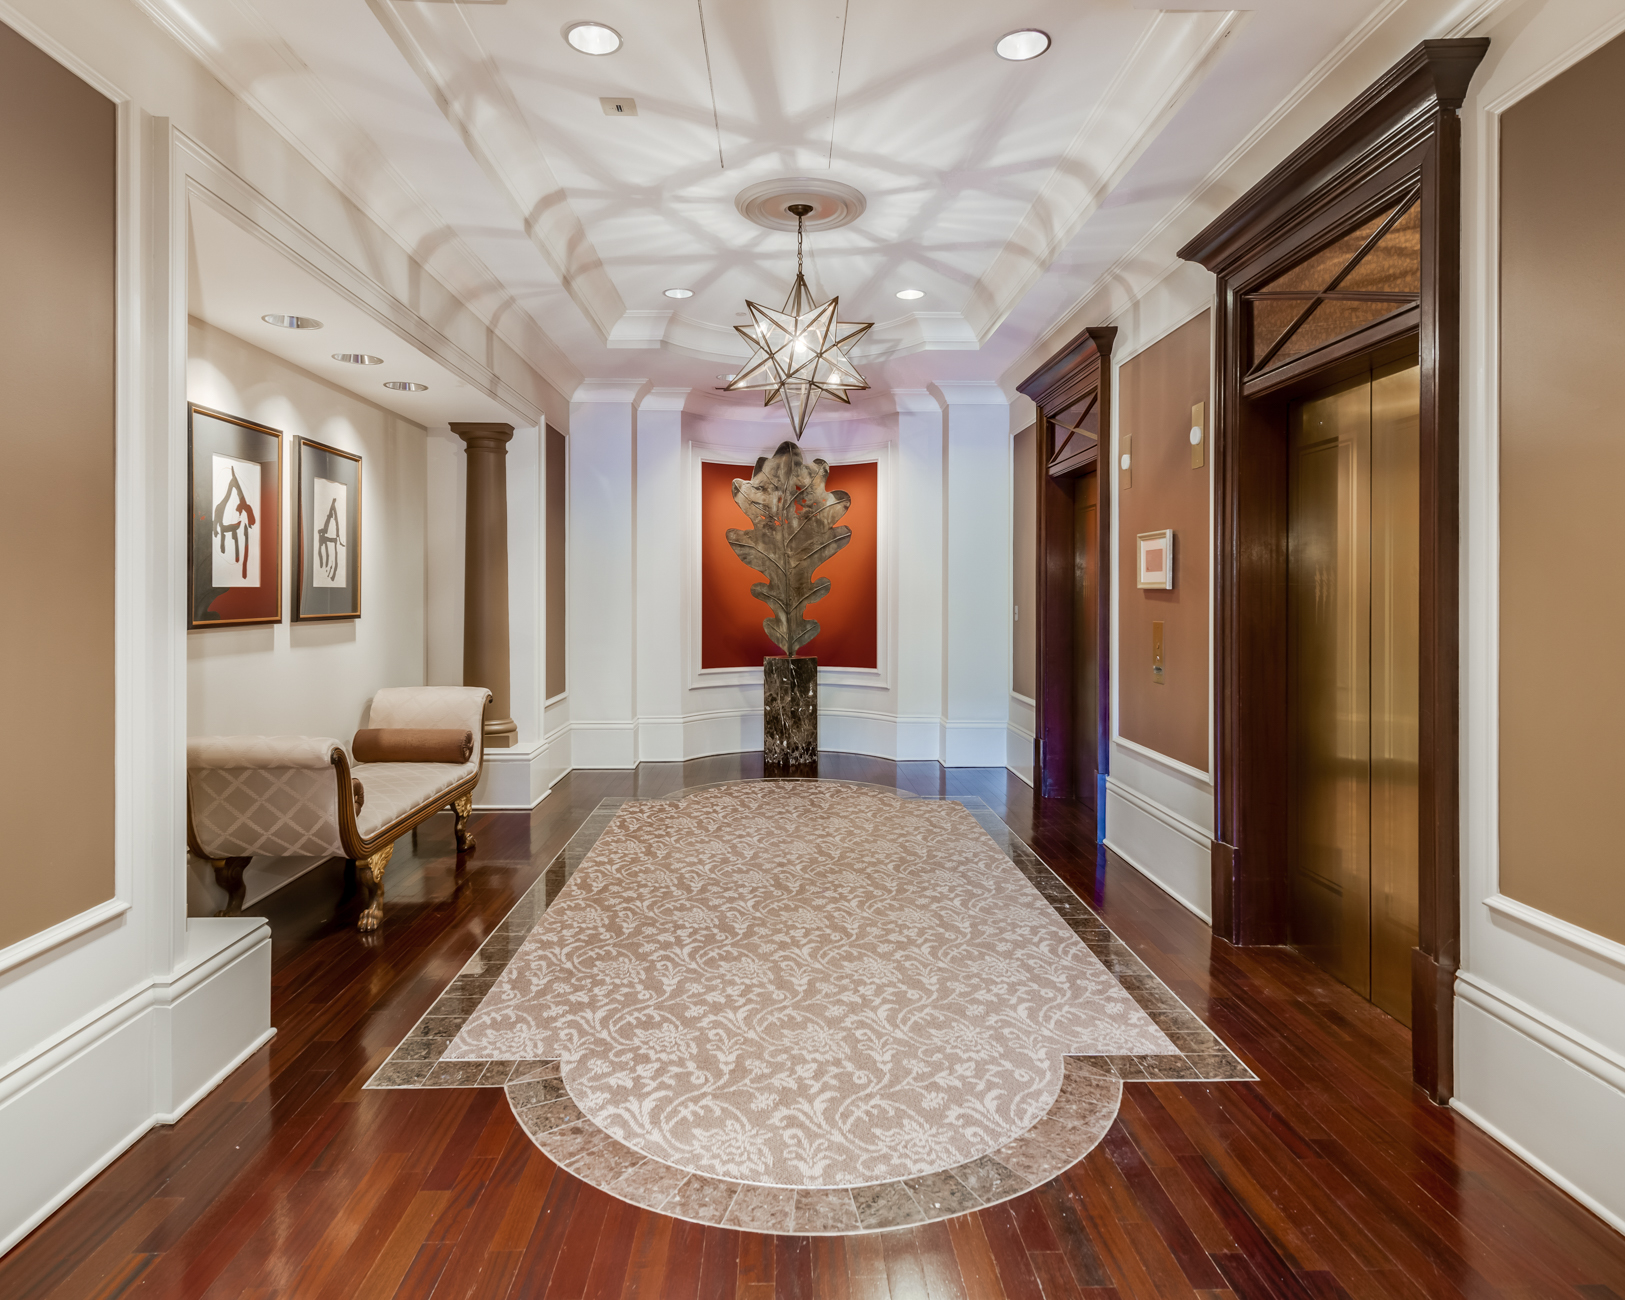 Additional photo for property listing at Carondelet Plaza 150 Carondelet Plaza # 501 St. Louis, Missouri 63105 United States